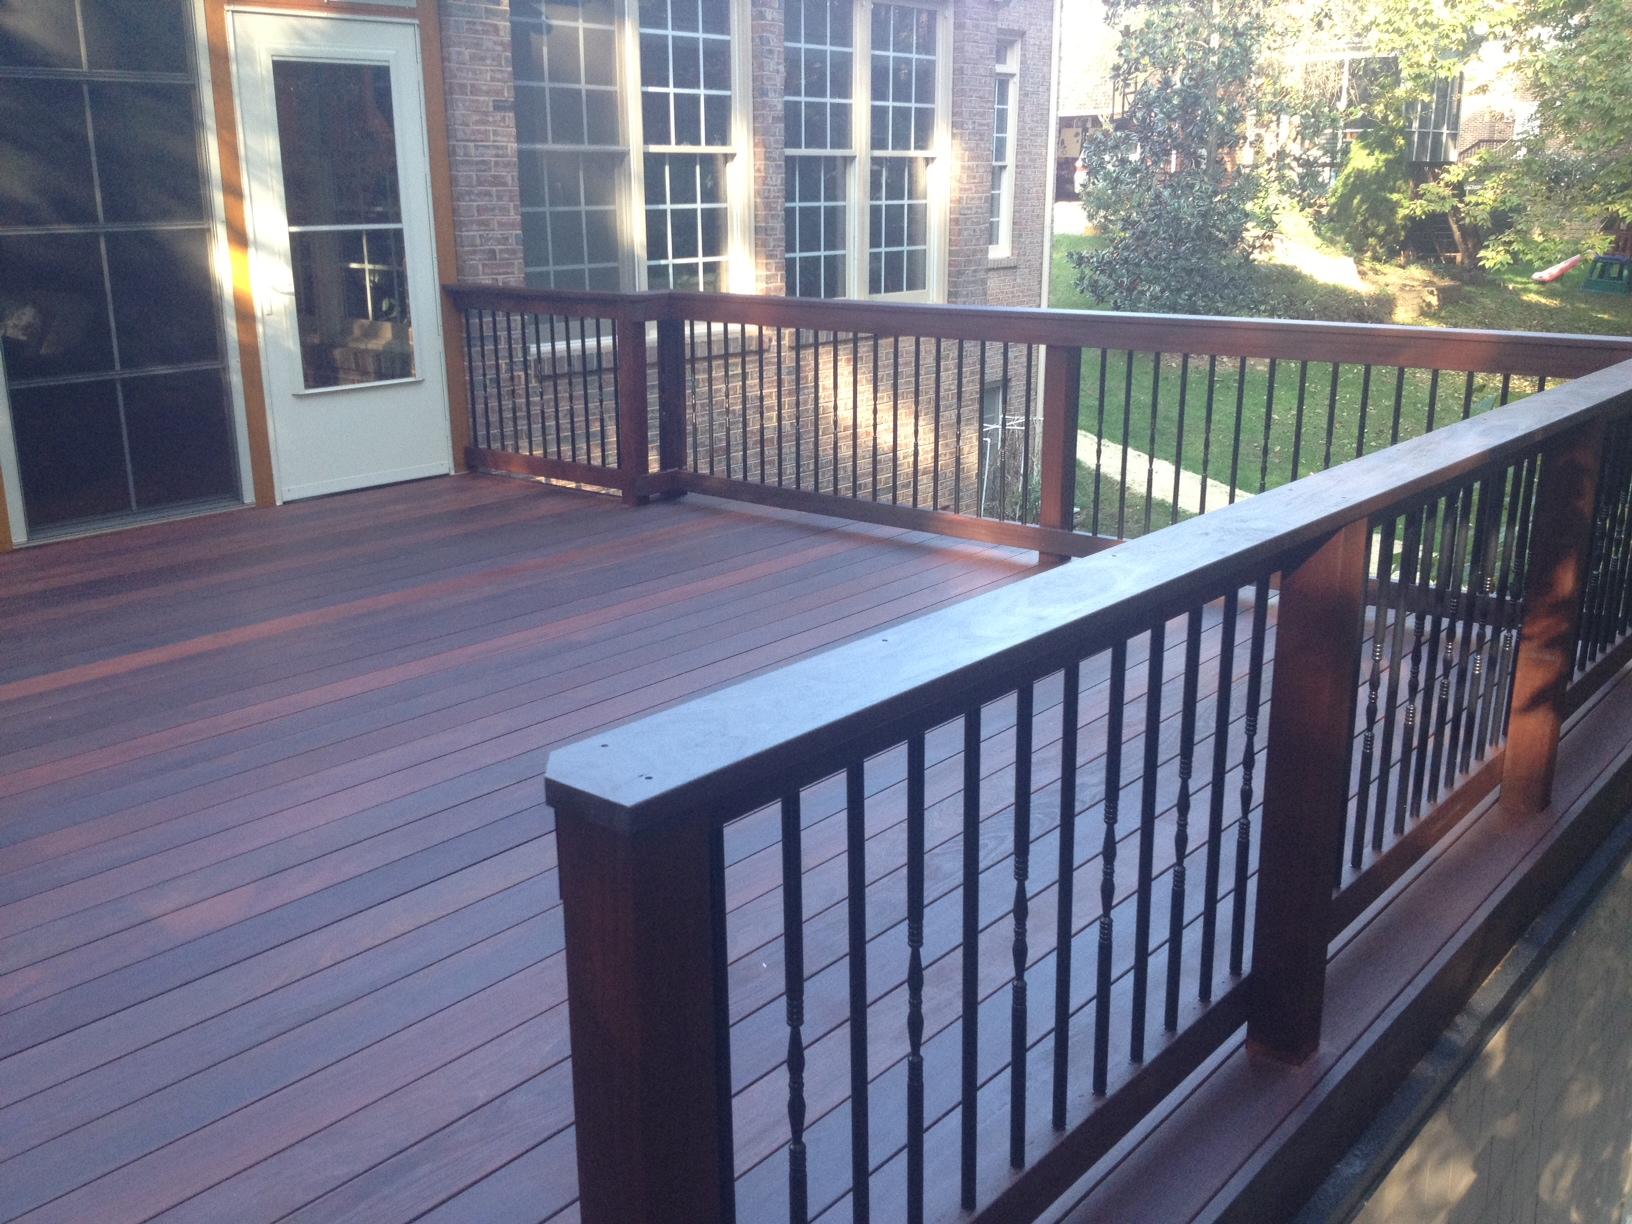 Ipe brazilian hardwood decking is becoming popular for for Ipe vs composite decking